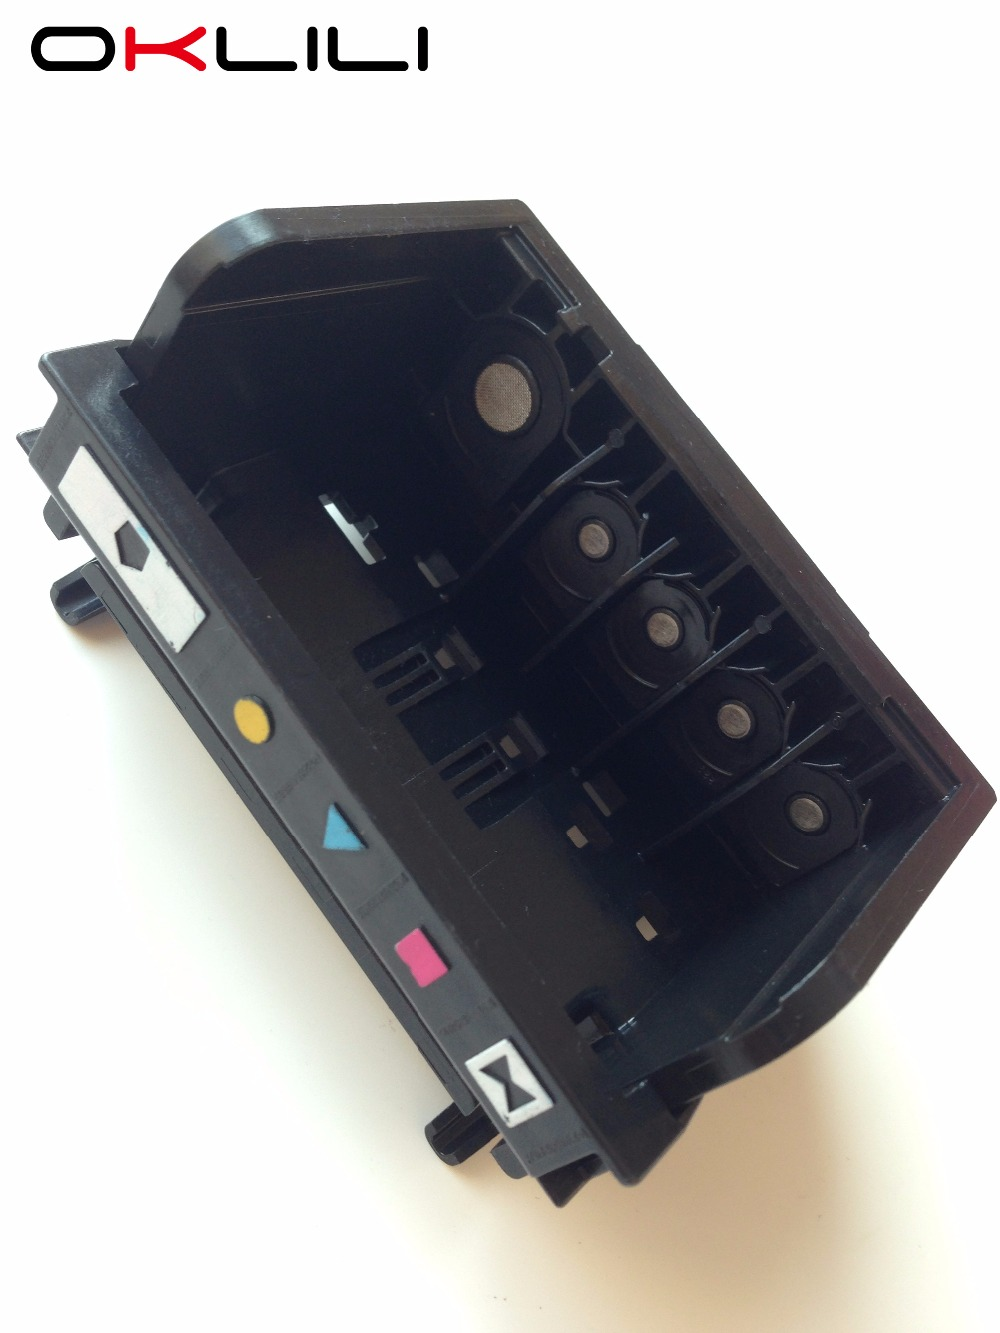 CB326-30002 CN642A 564 564XL 5-слоттары Басып шығару механизміне арналған басып шығарғыш баспа бастиегі HP 7510 7520 D5460 D7560 B8550 C5370 C5380 C6300 C6380 D5400 D7560